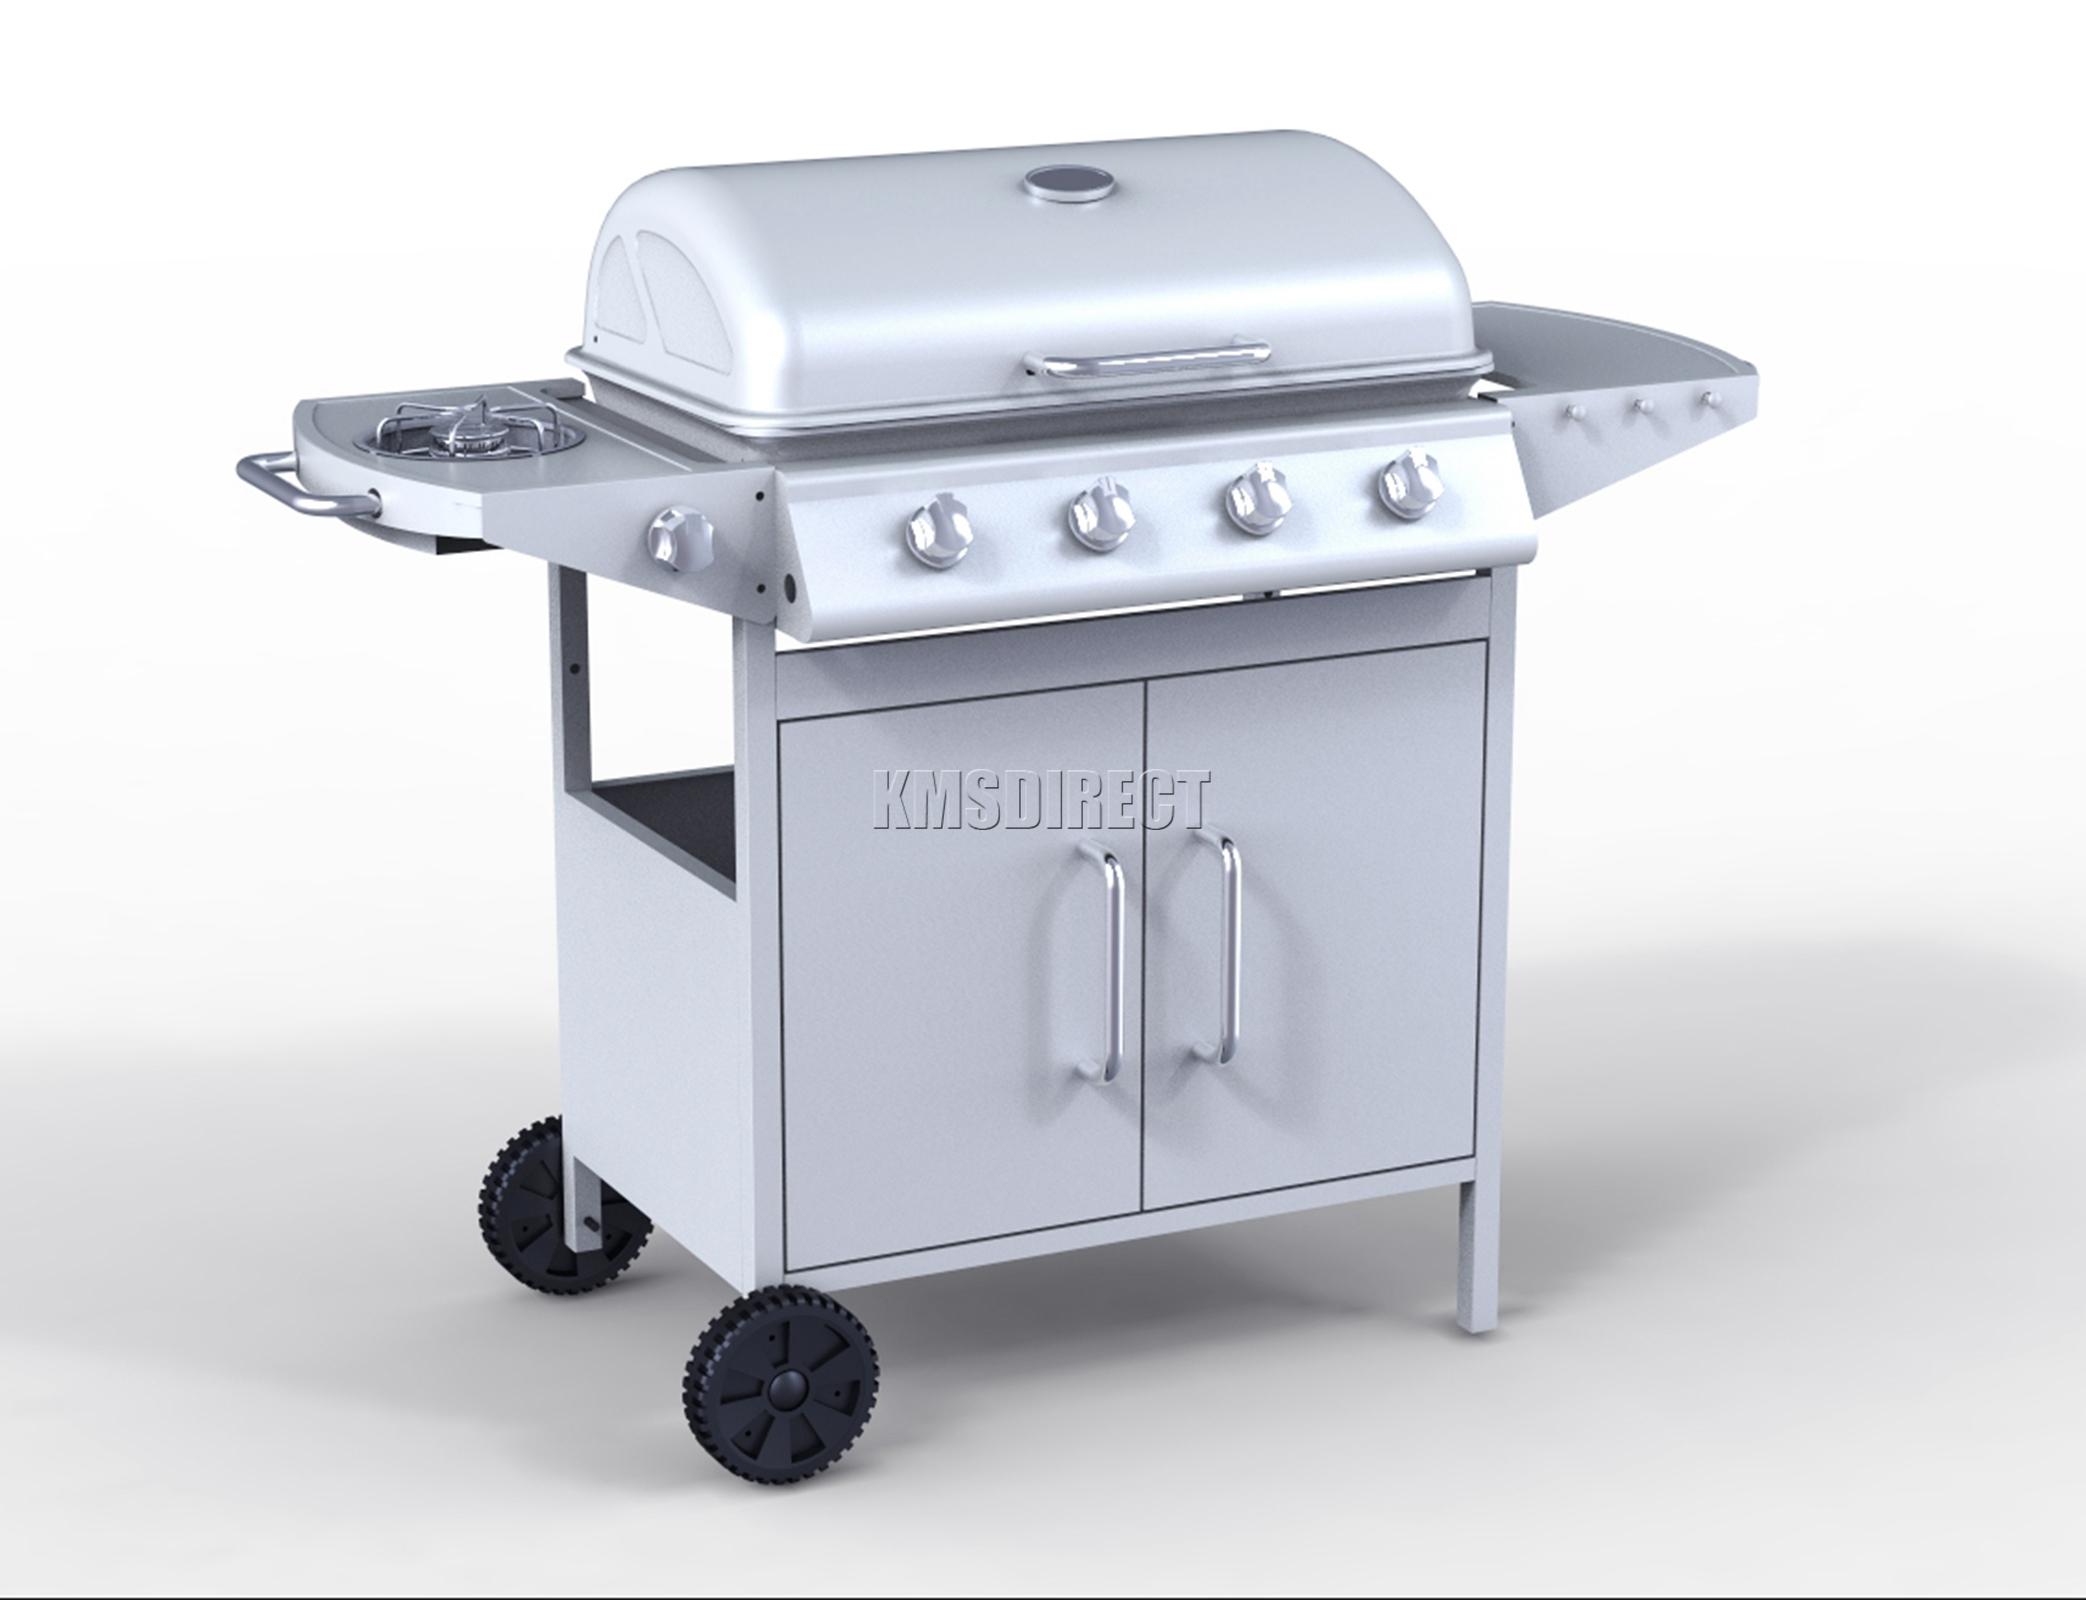 Foxhunter burner bbq gas grill silver steel barbecue